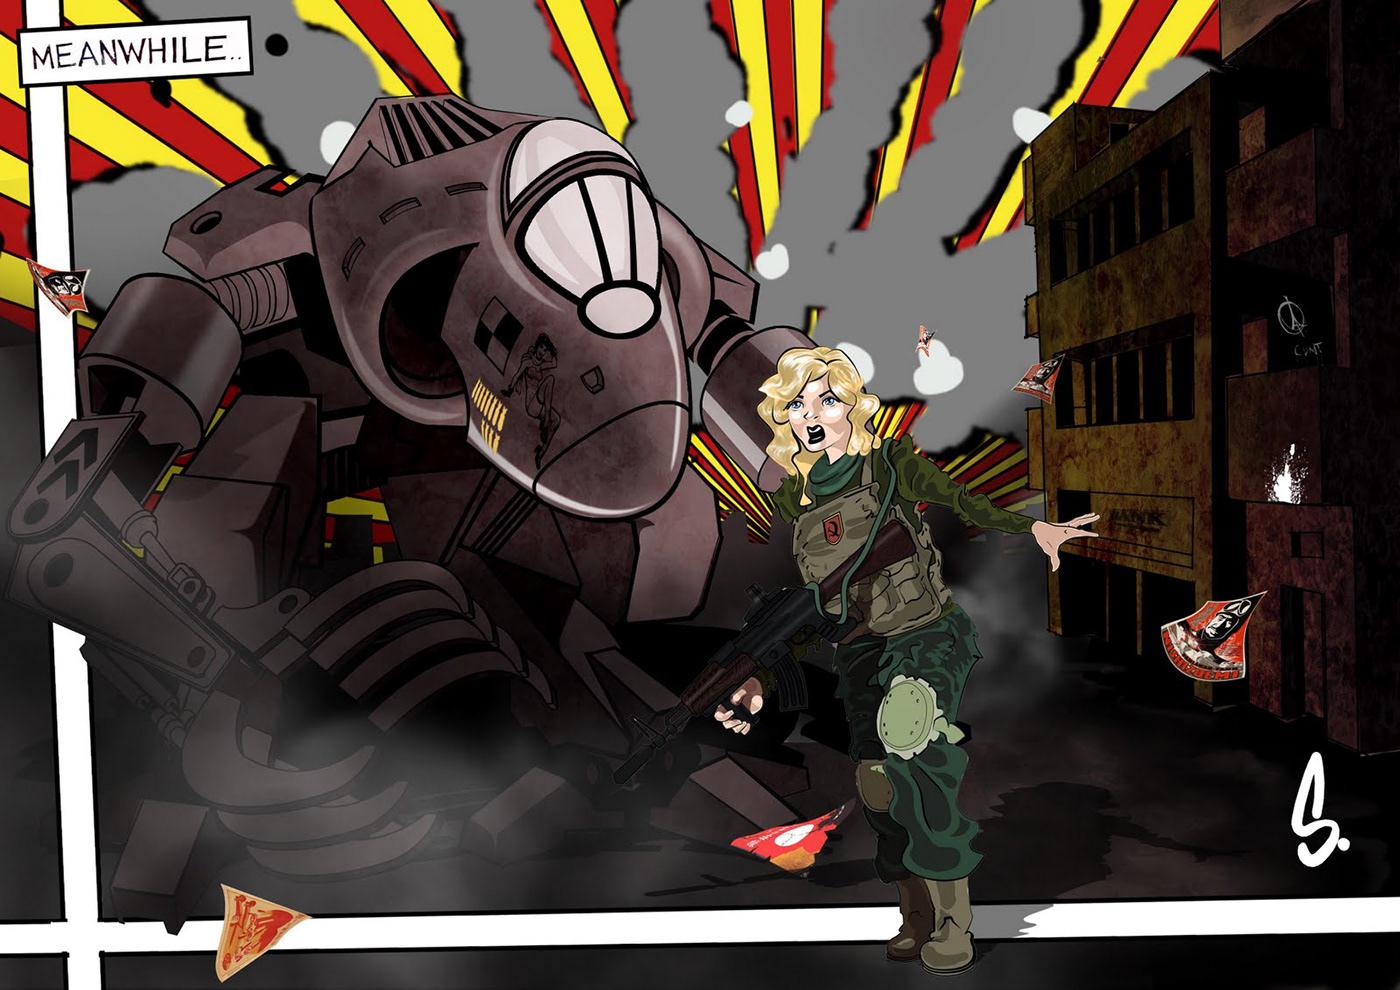 Image may contain: cartoon, screenshot and anime